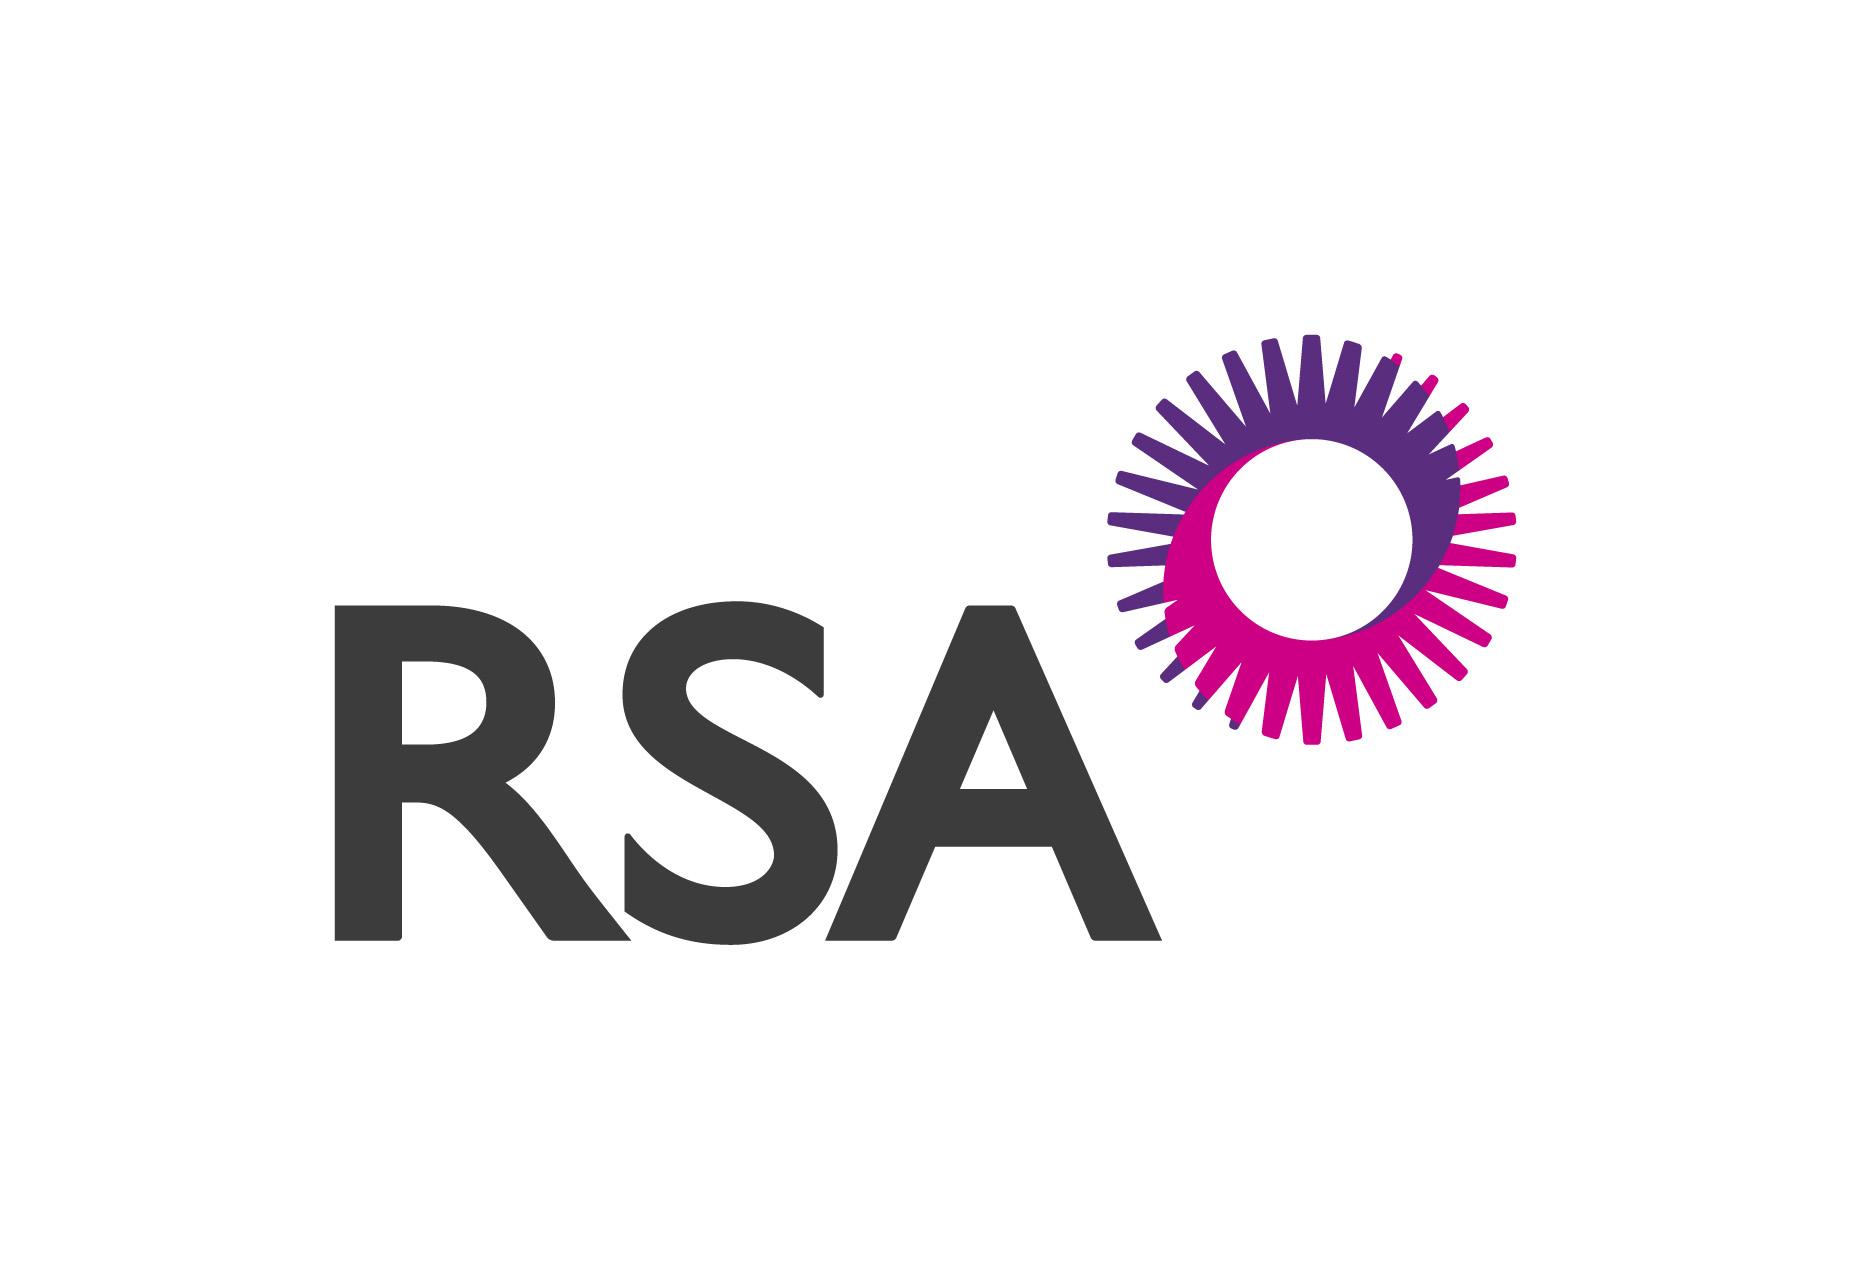 RSA-RGB-2POS-HI_0qw.jpg